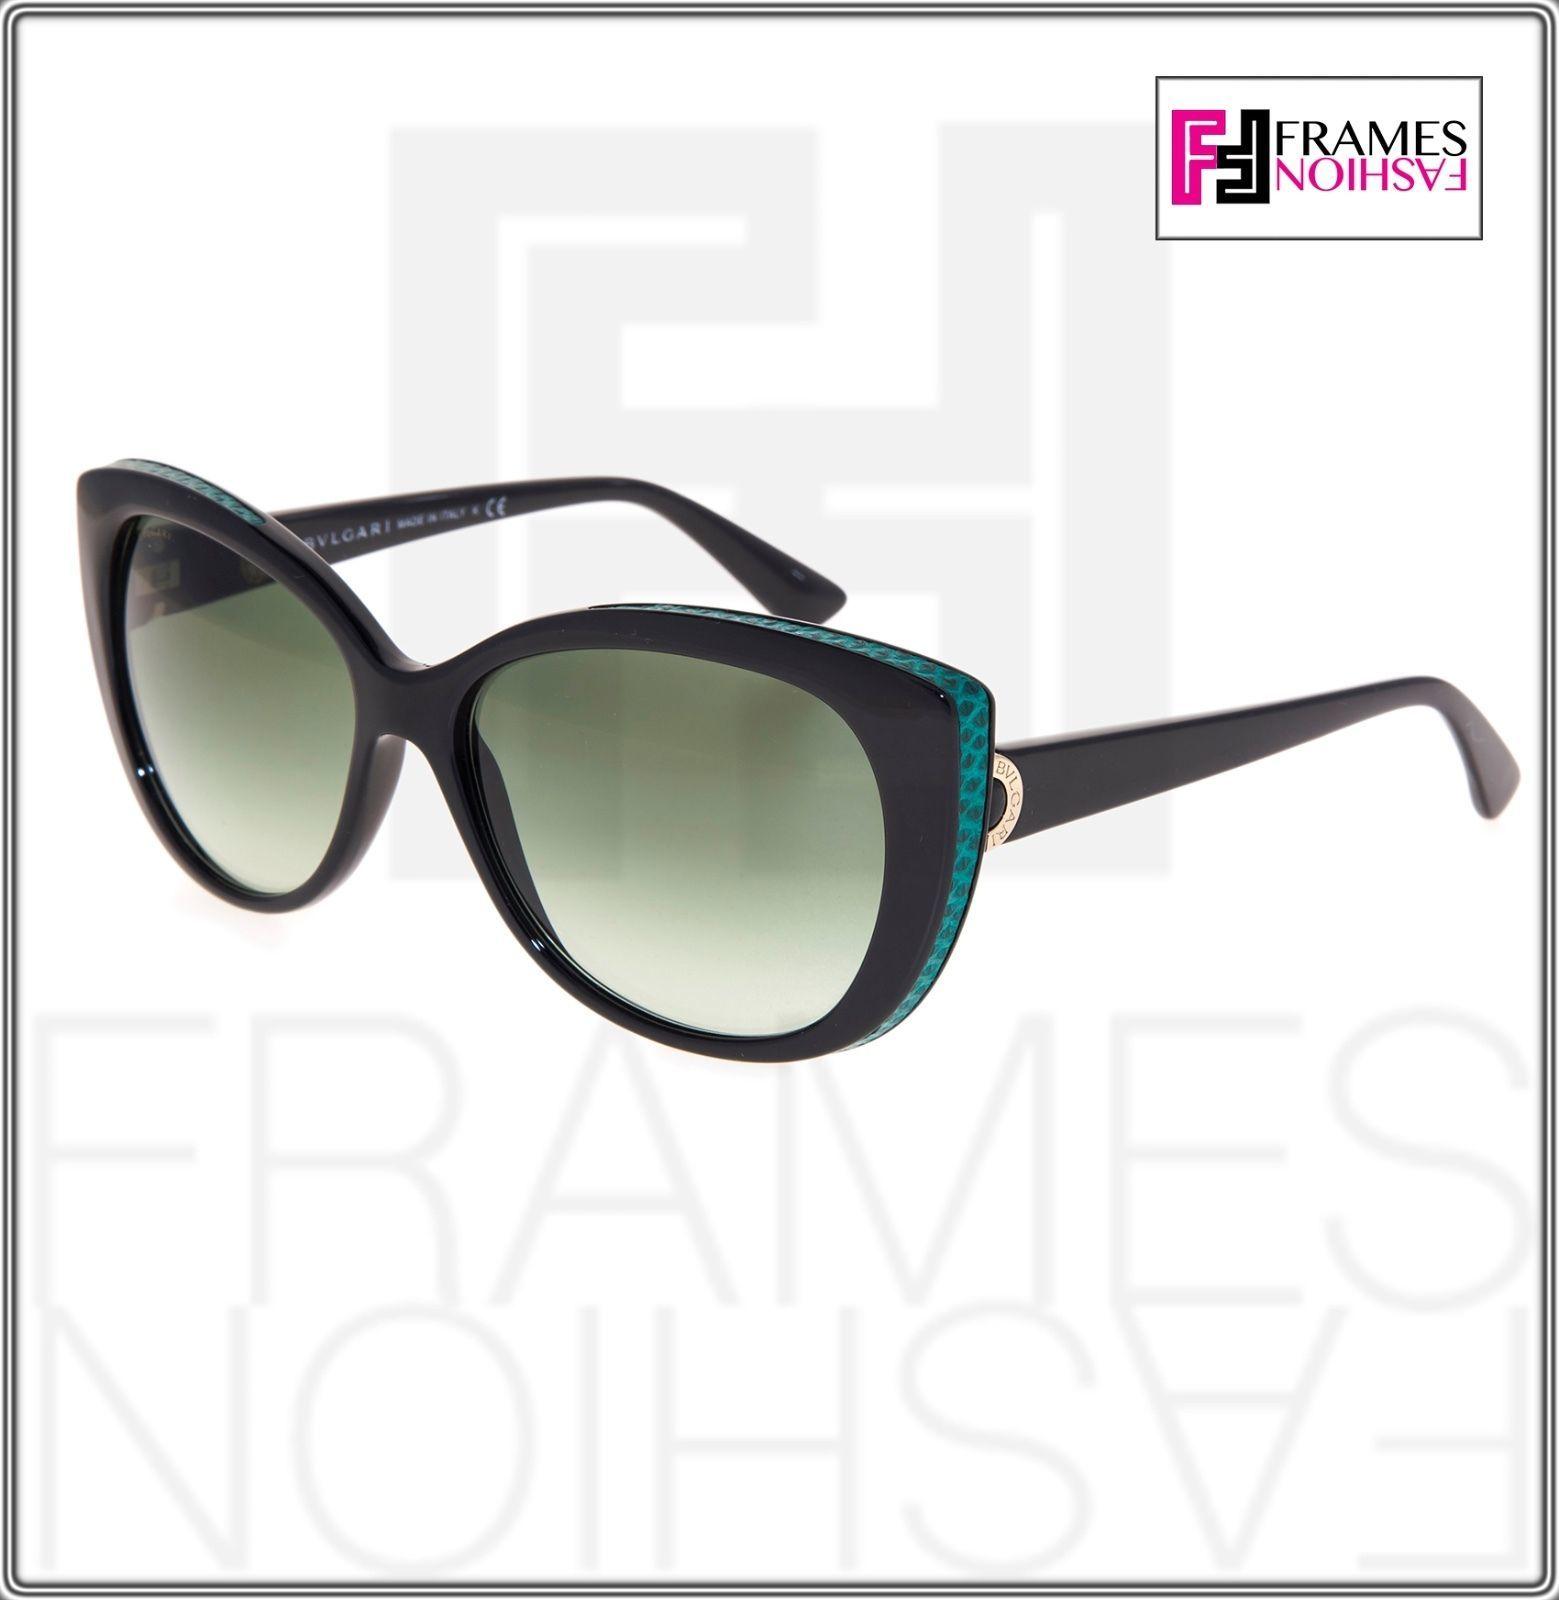 BVLGARI LOGO BV8169Q Black Green Leather Gradient Cat Eye Sunglasses Gold 8169 image 7